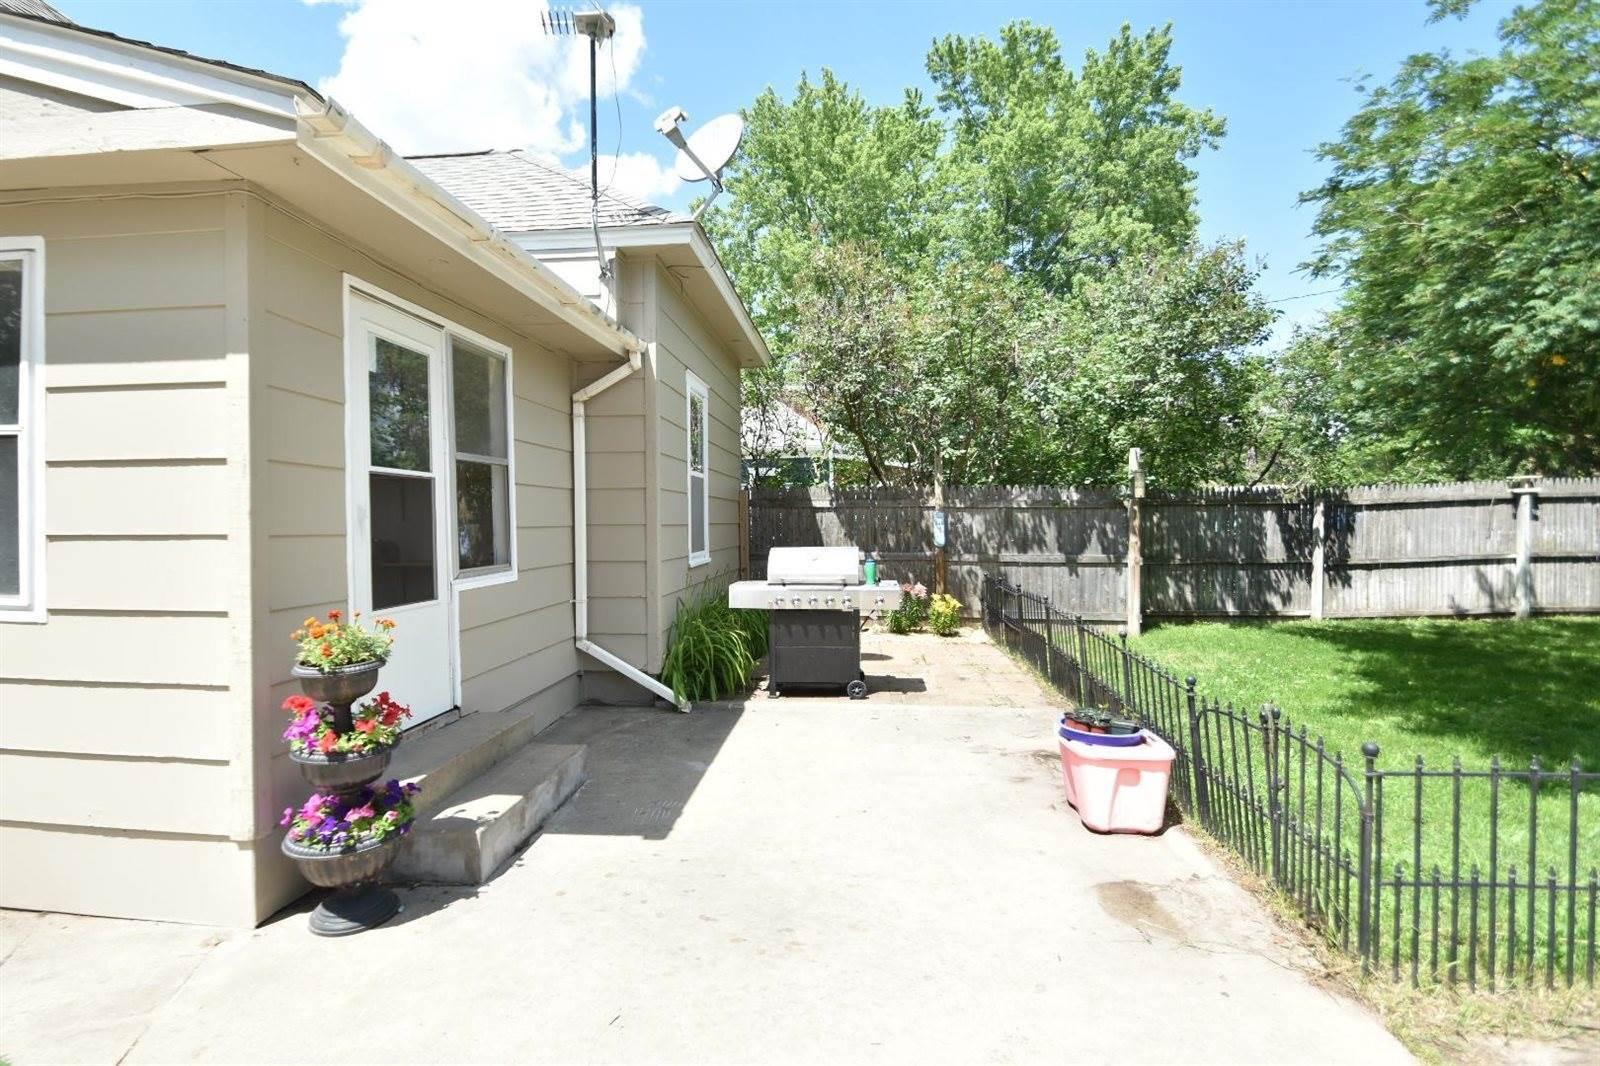 1015 South 6th Street, Brainerd, MN 56401